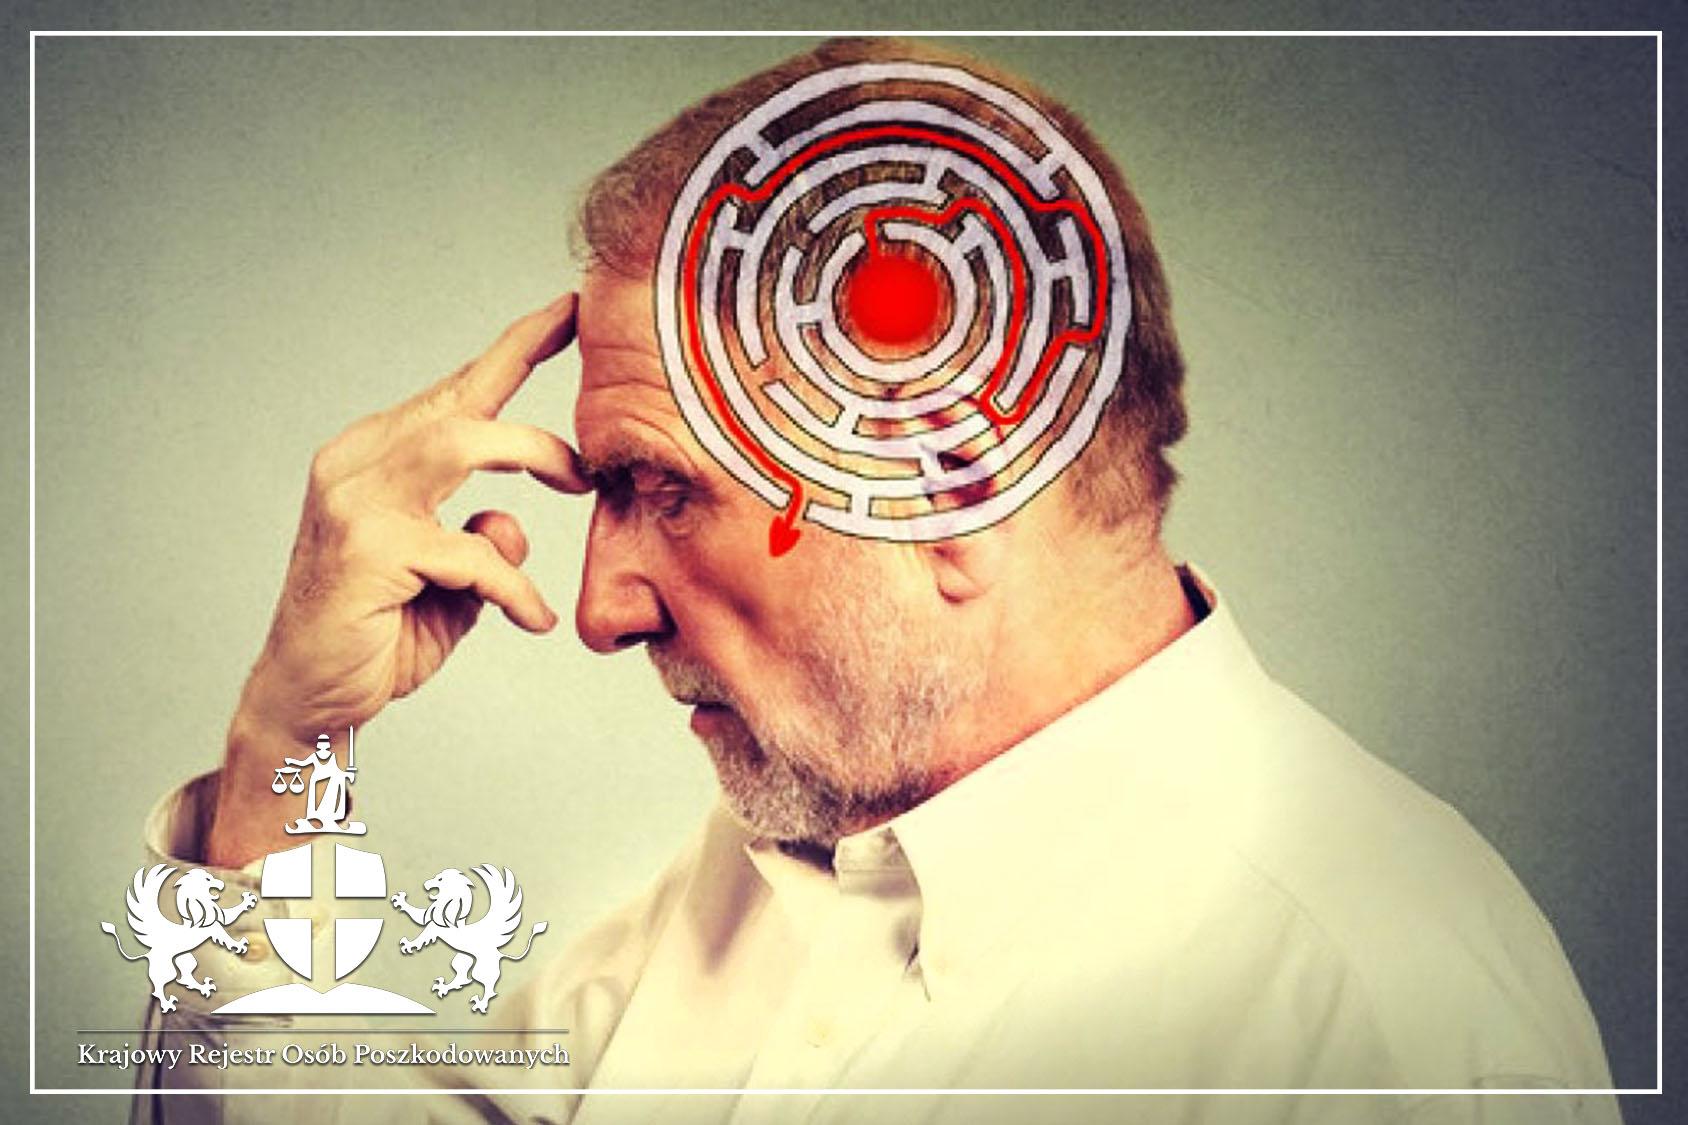 Udar mózgu profilaktyka